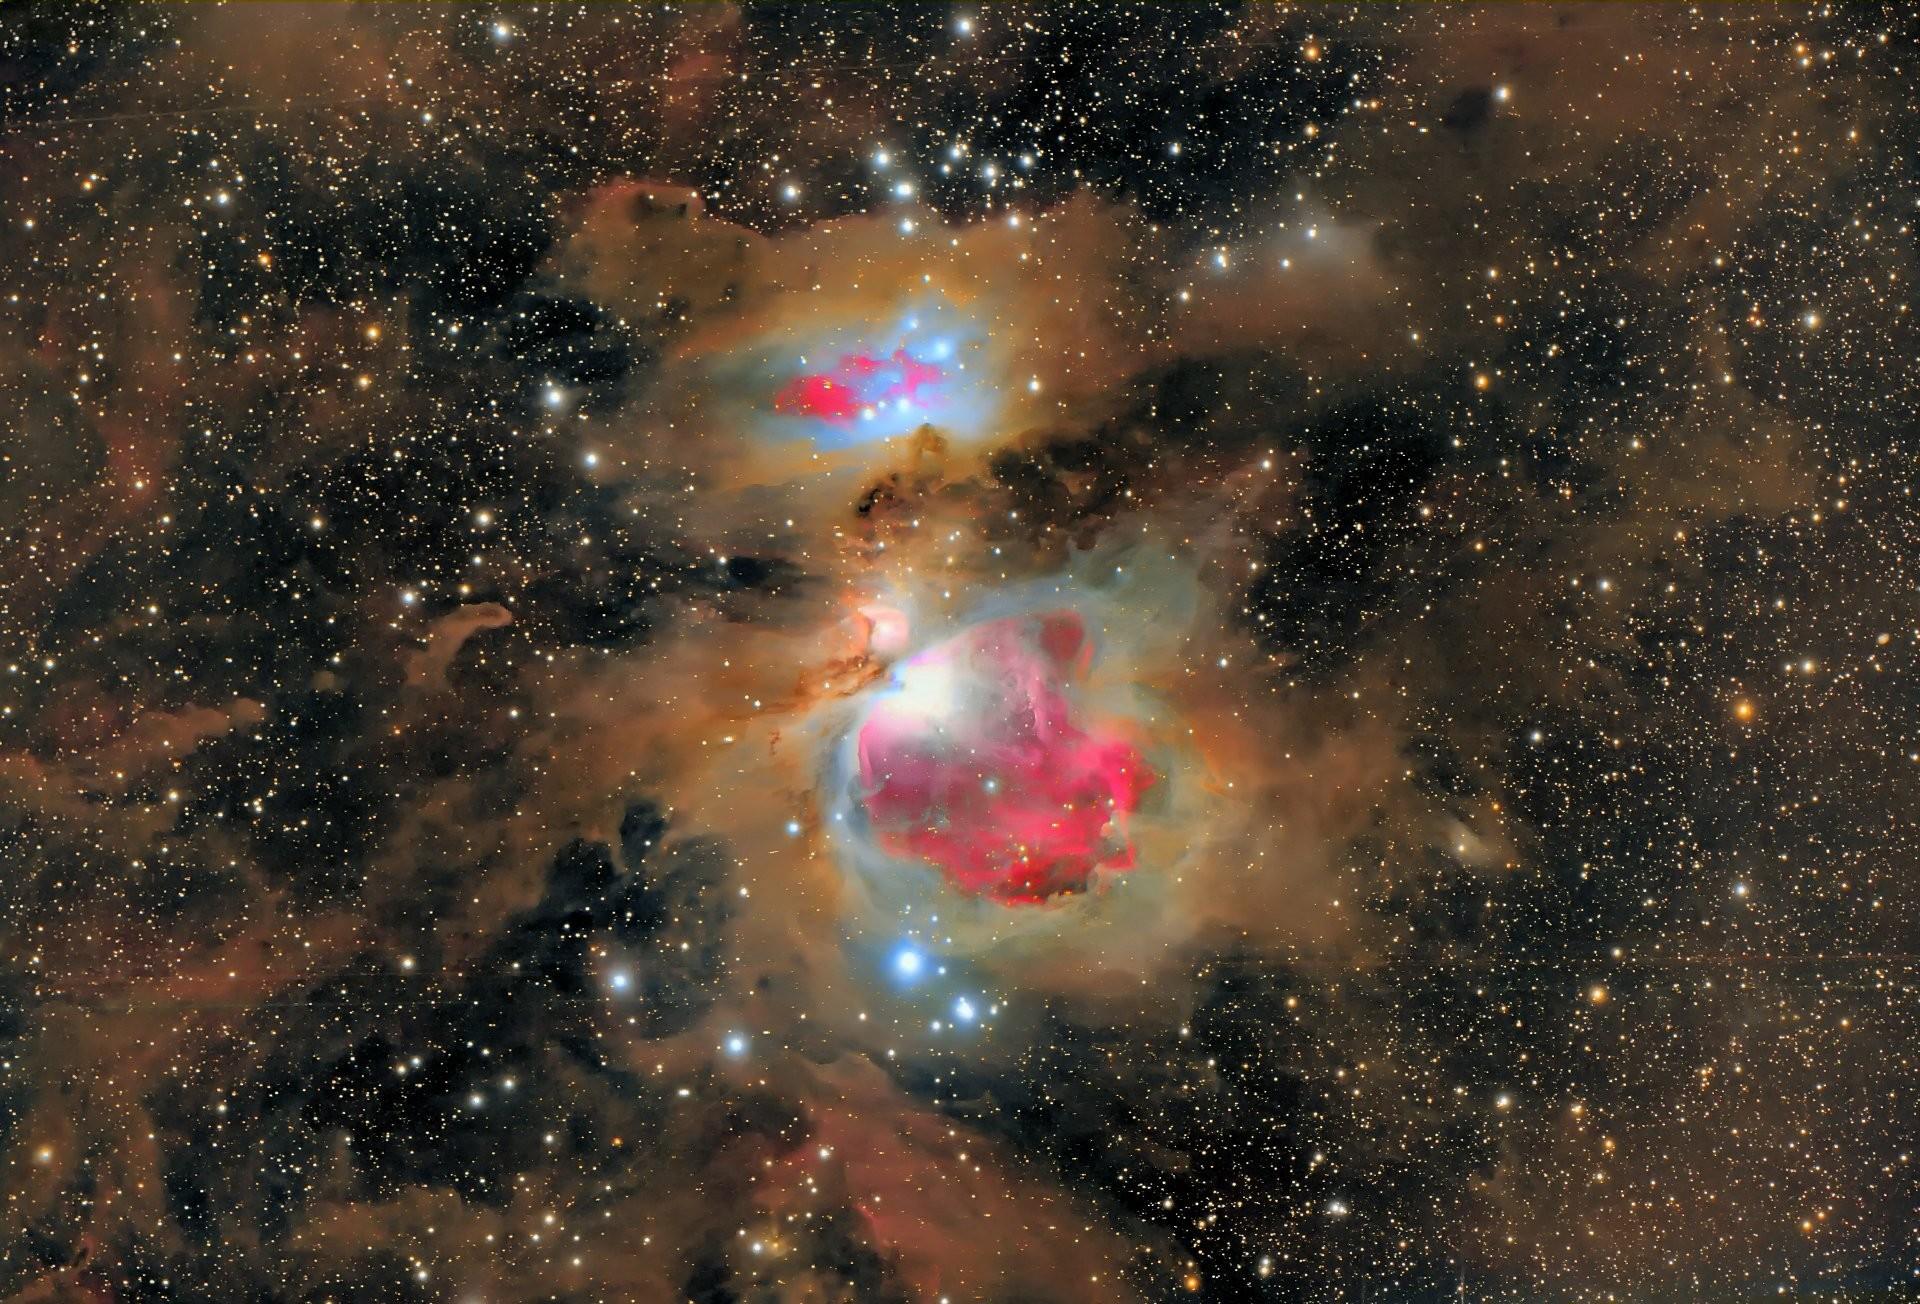 orion constellation nebula m42 m43 dust keystone